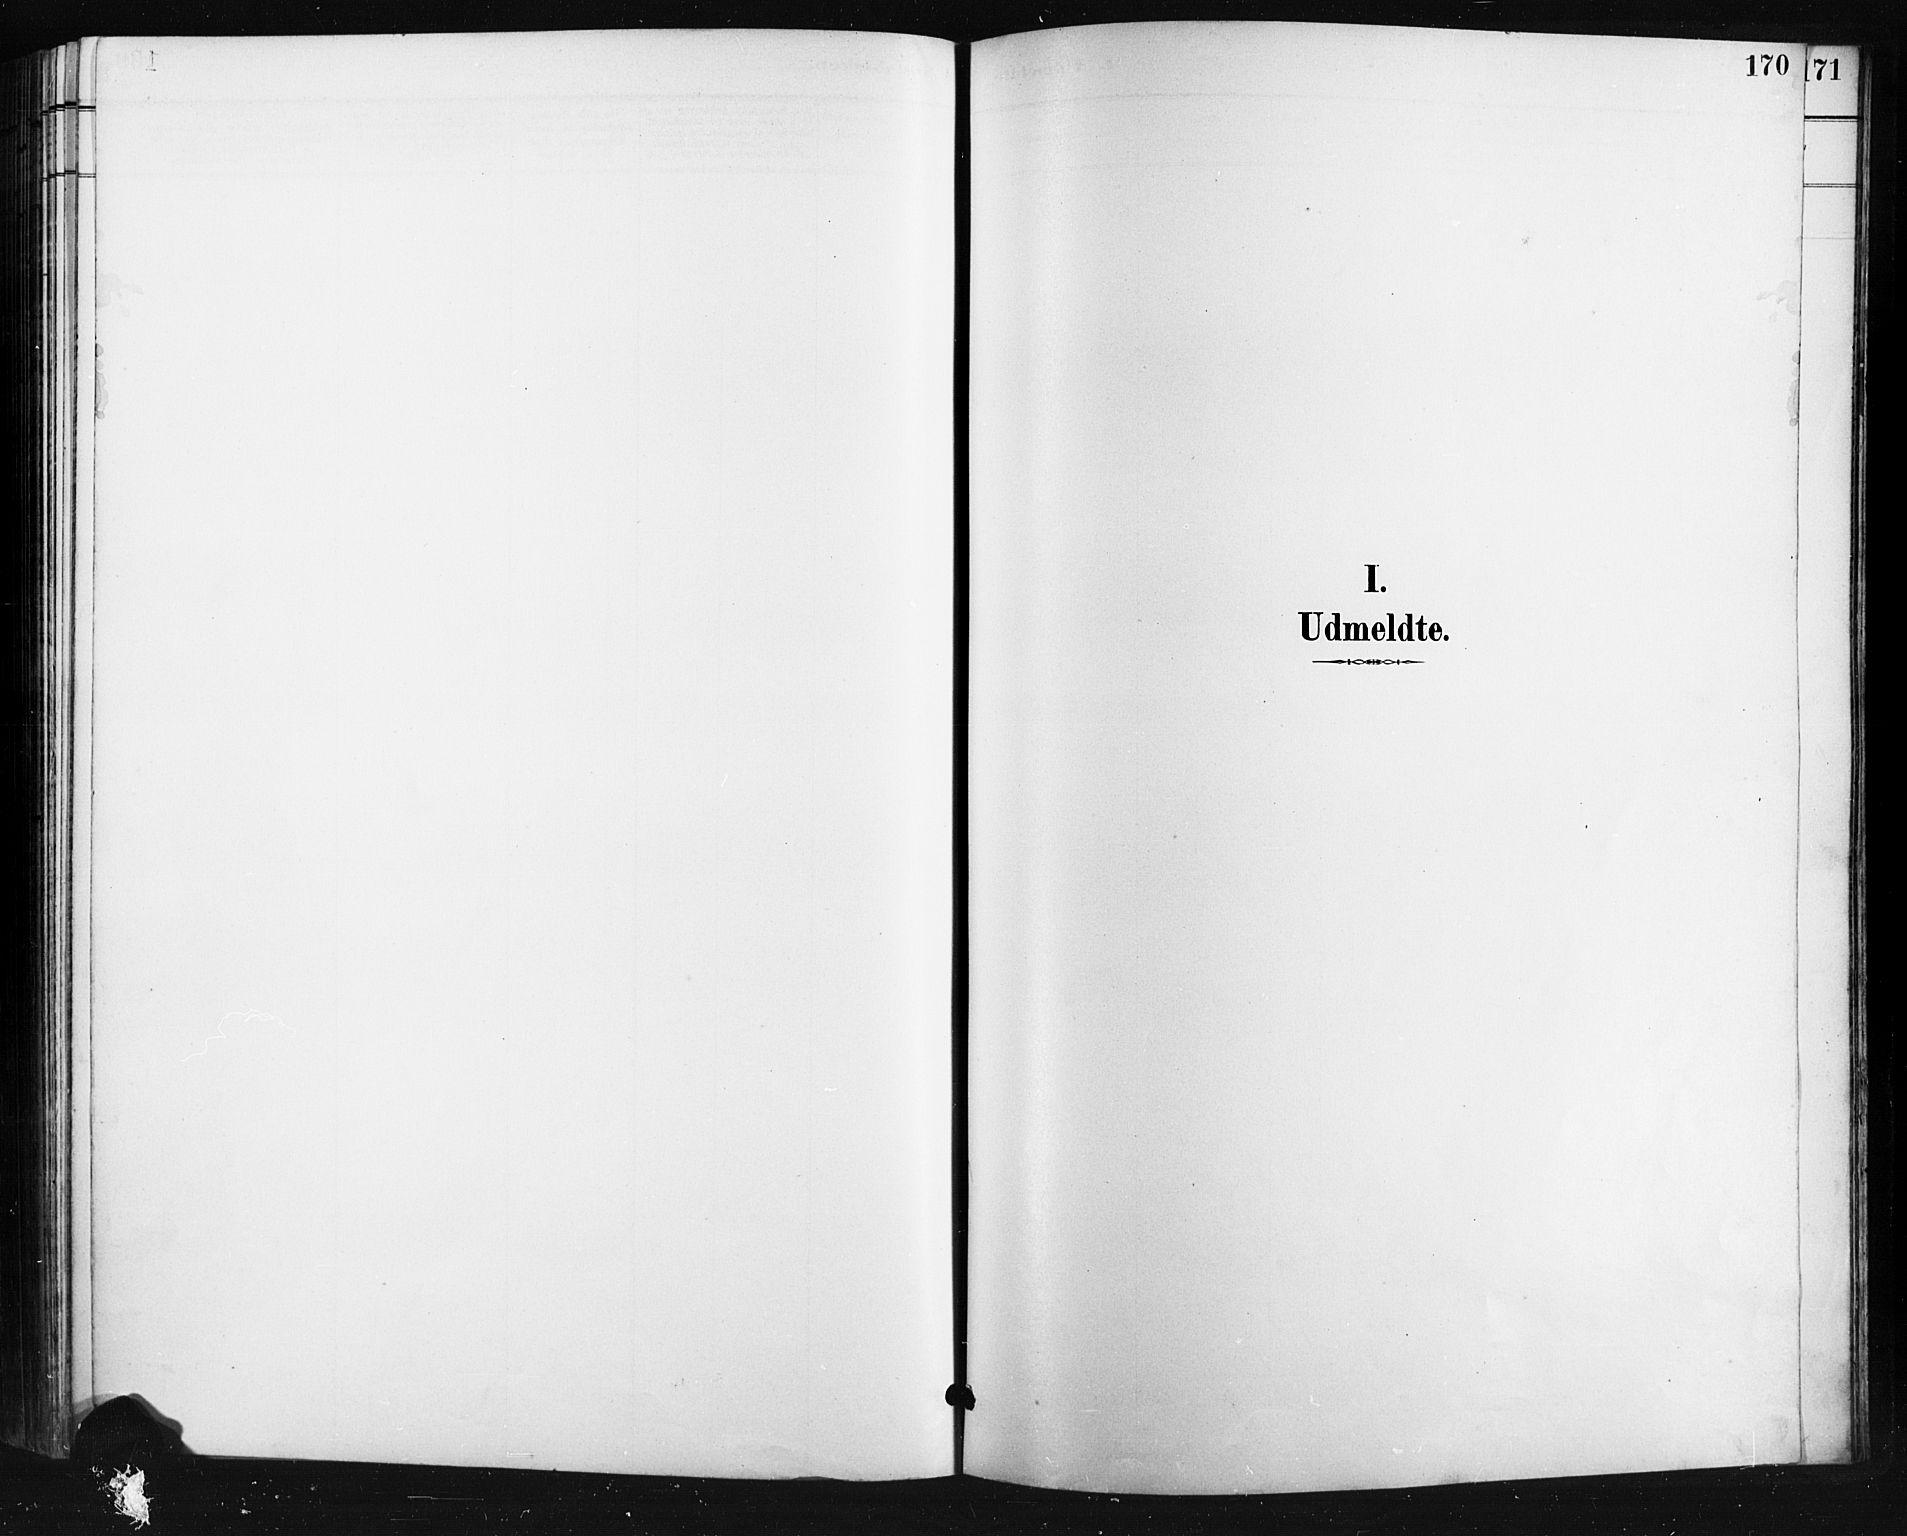 SAH, Skjåk prestekontor, Klokkerbok nr. 4, 1895-1921, s. 170